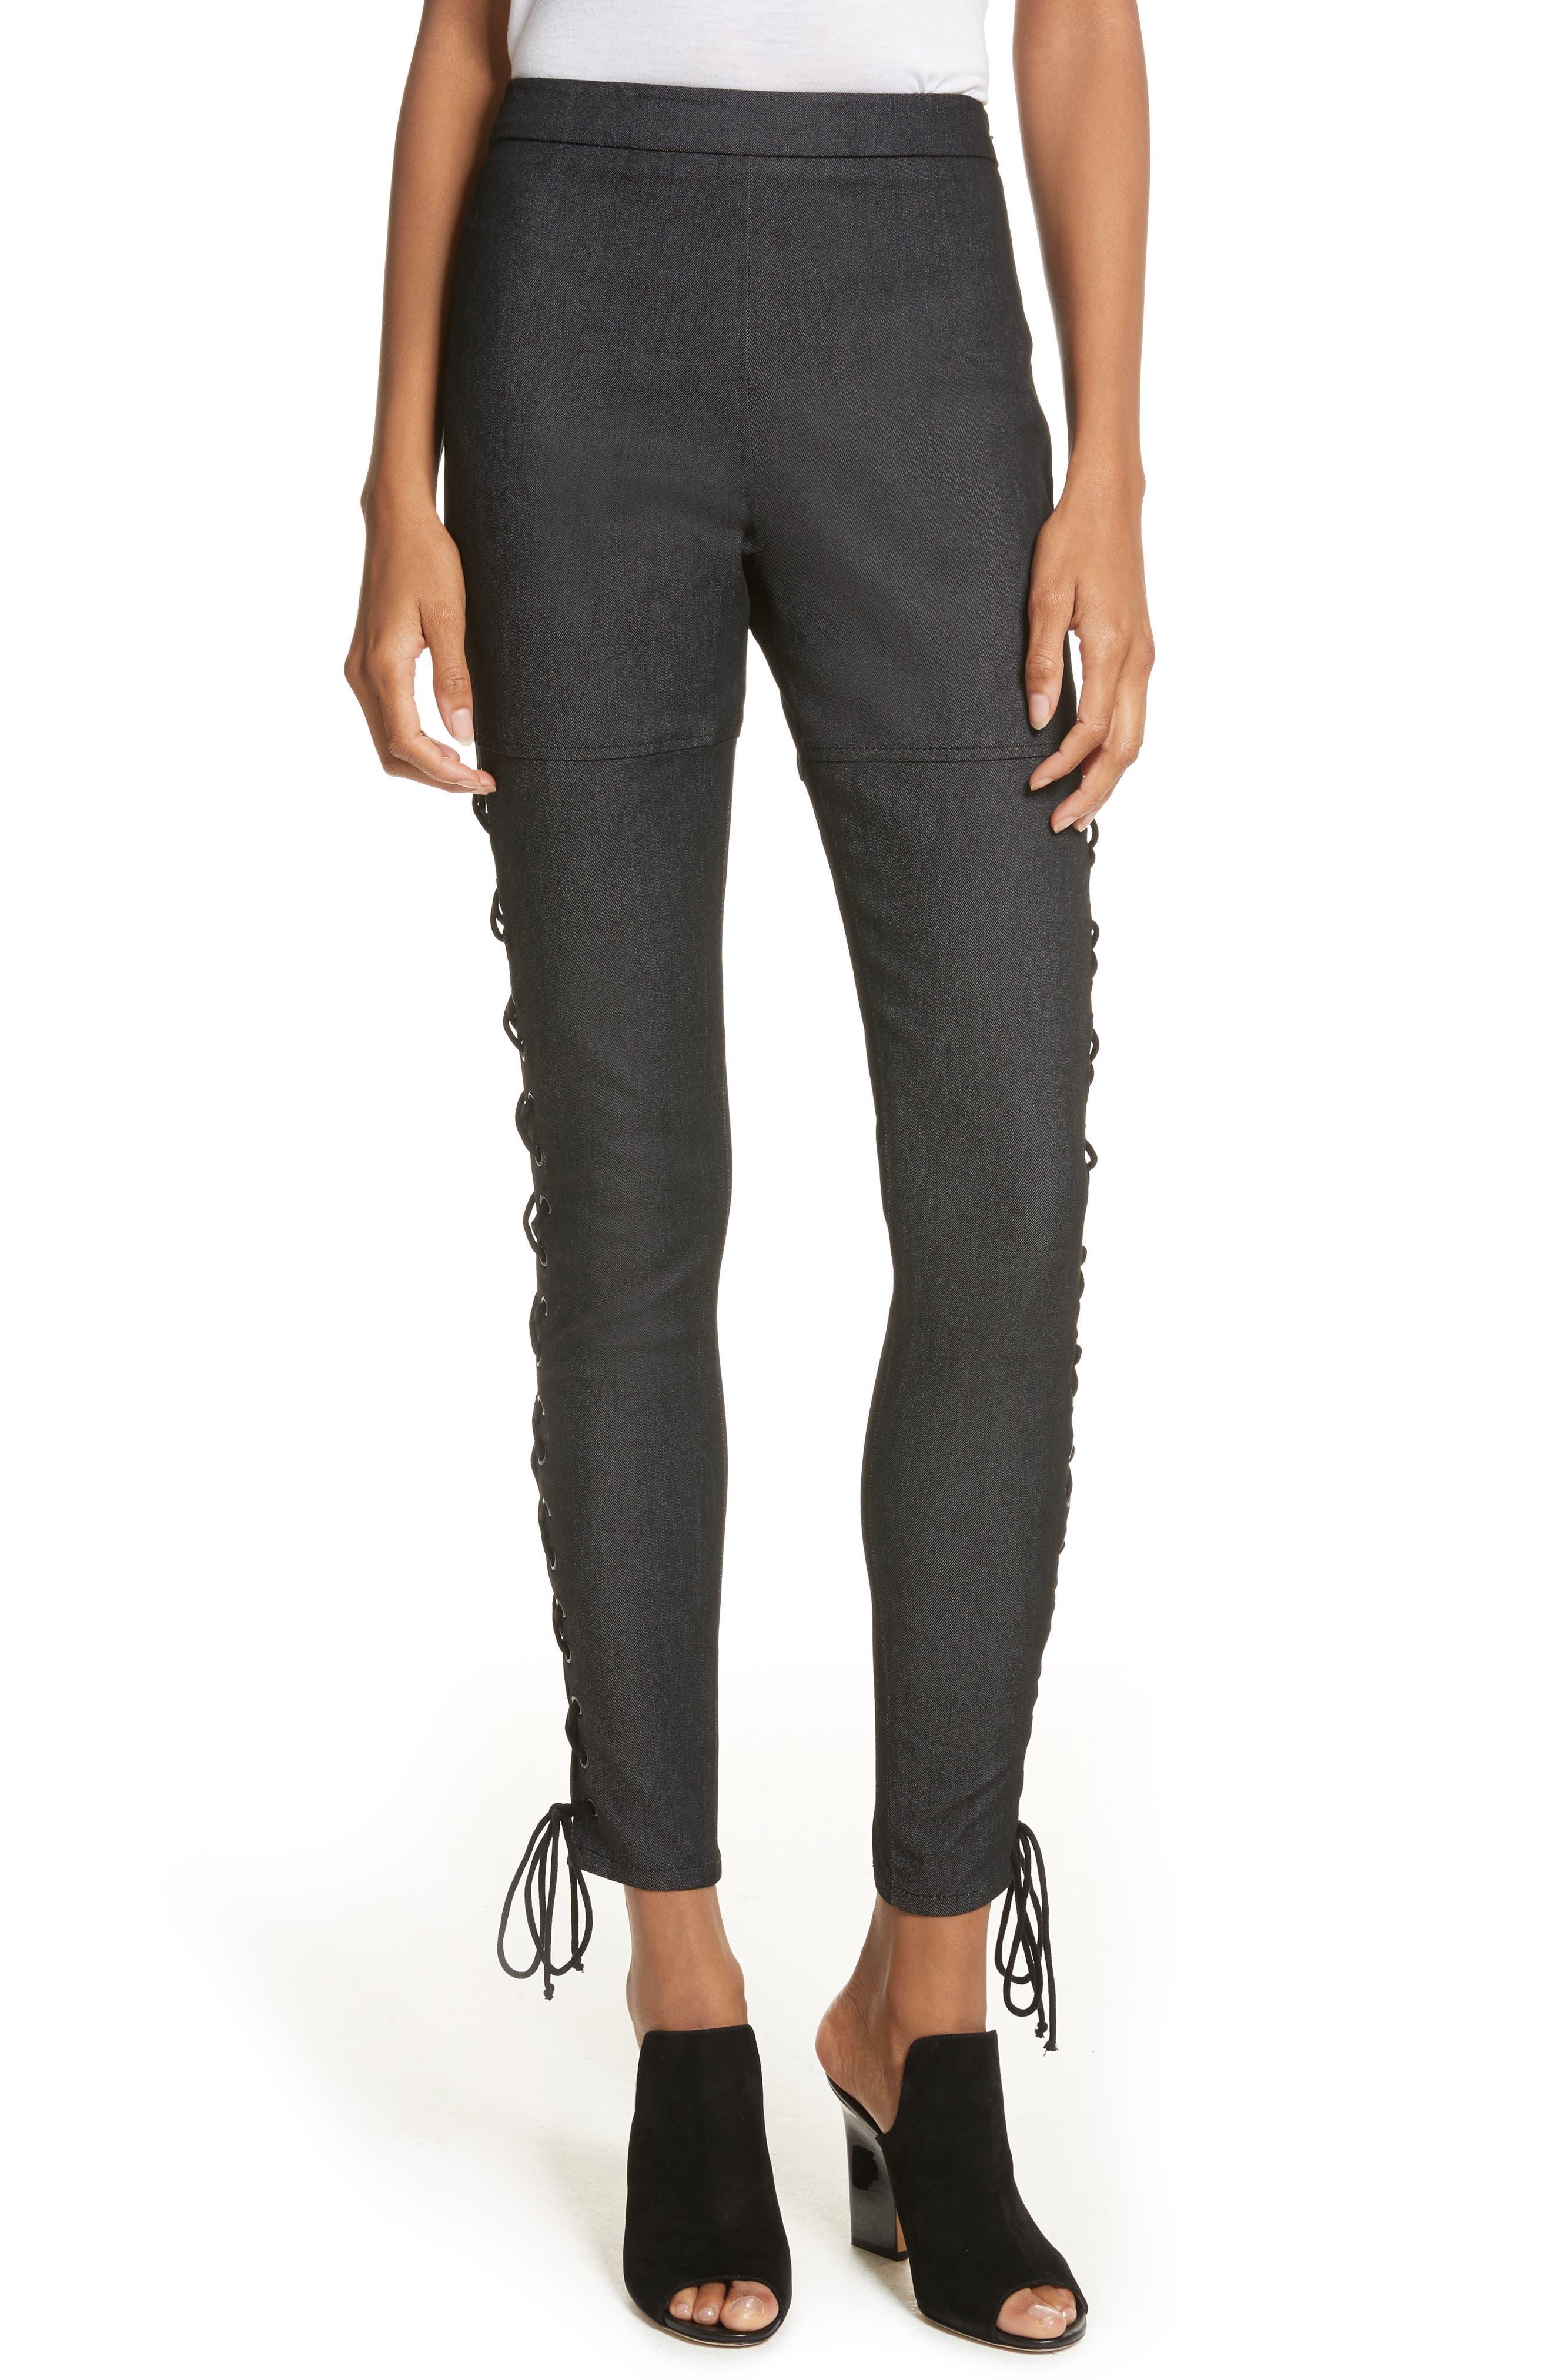 Kiran Lace-Up Stretch Denim Pants,                         Main,                         color, Black